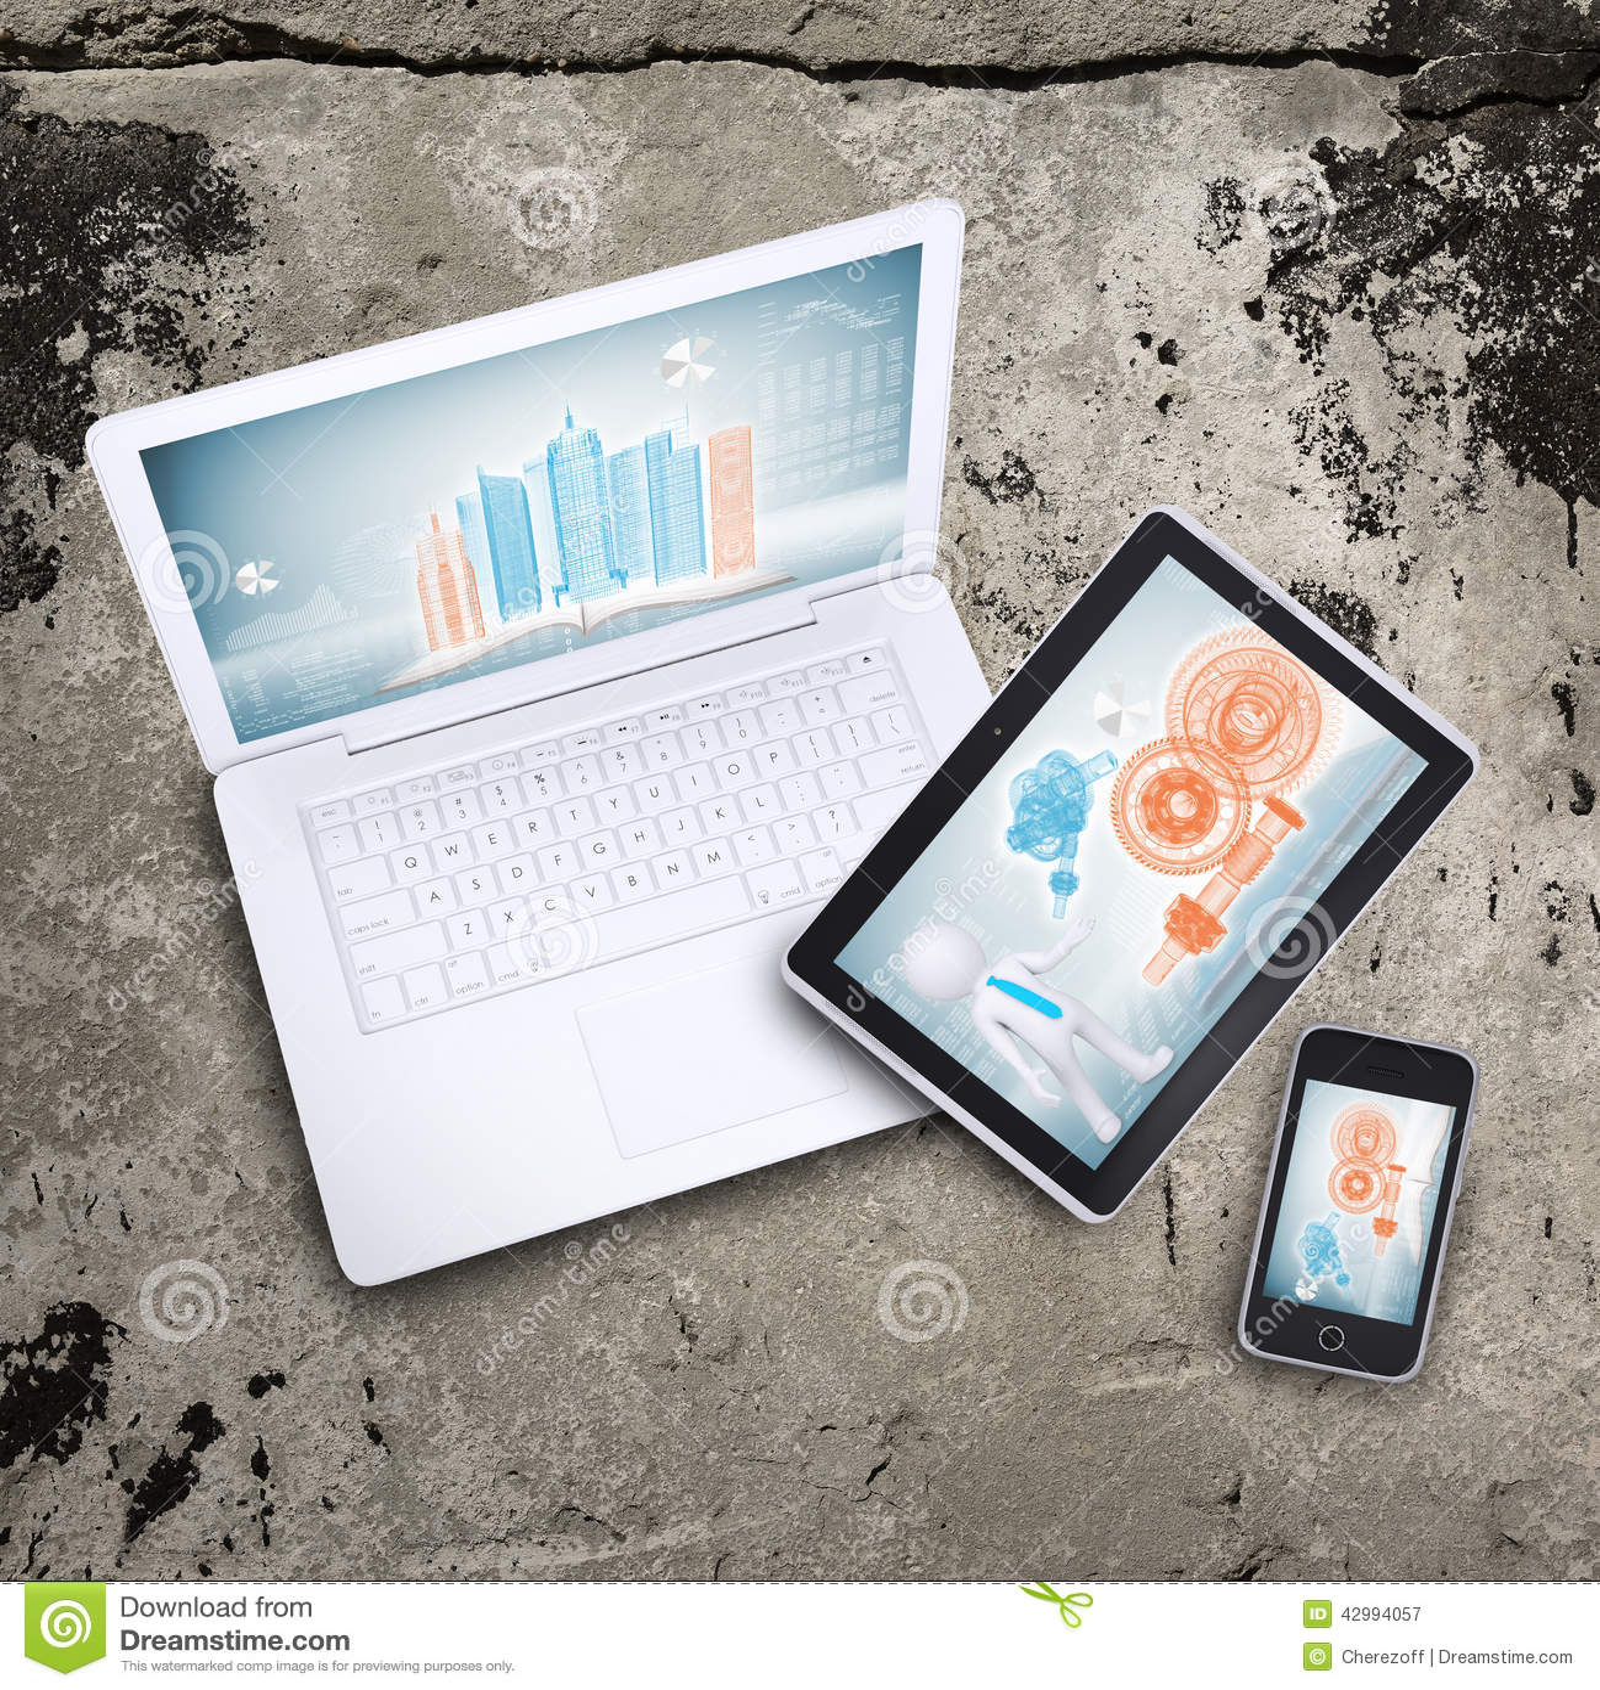 Laptop, pastylka komputer osobisty i mądrze telefon,